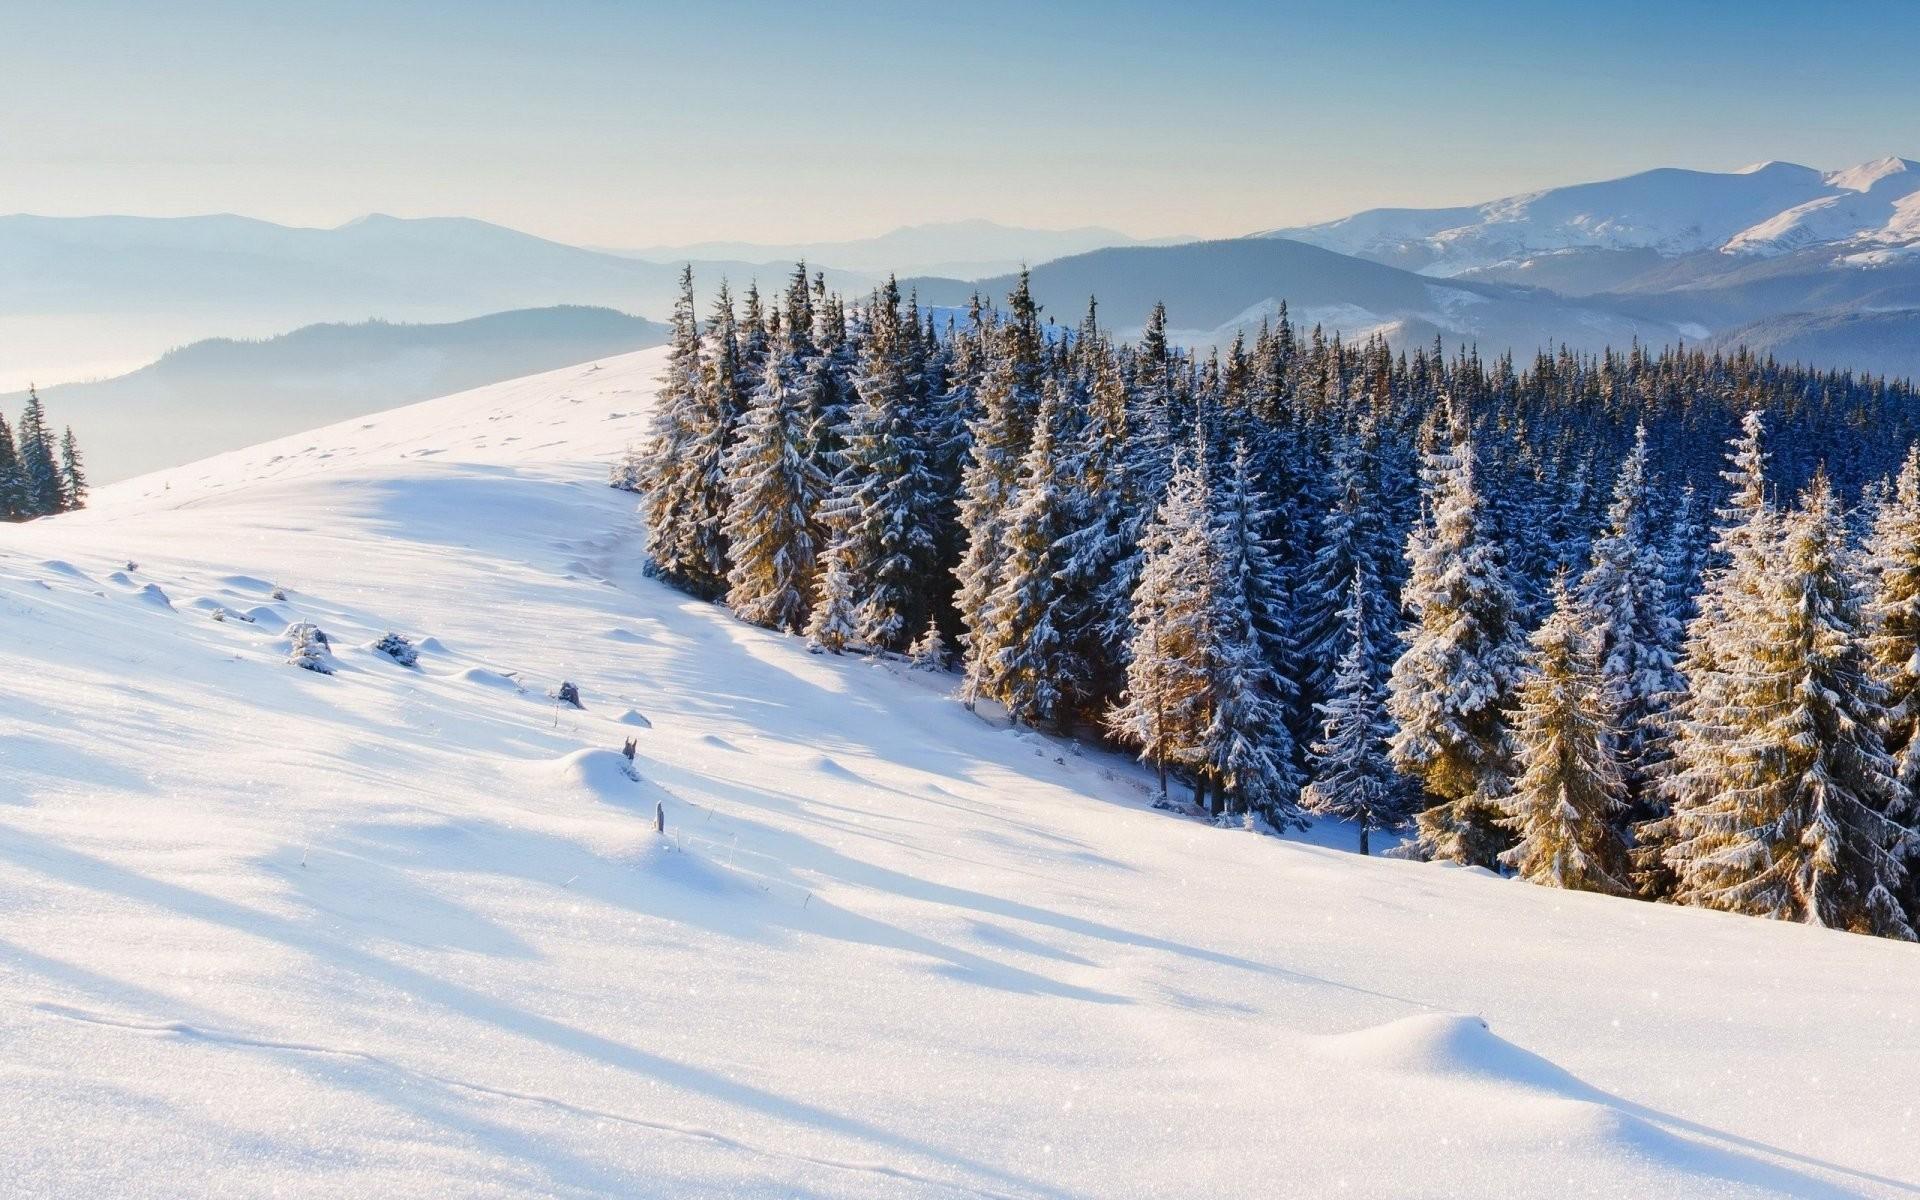 Snow christmas wallpaper 59 images - Christmas nature wallpaper ...